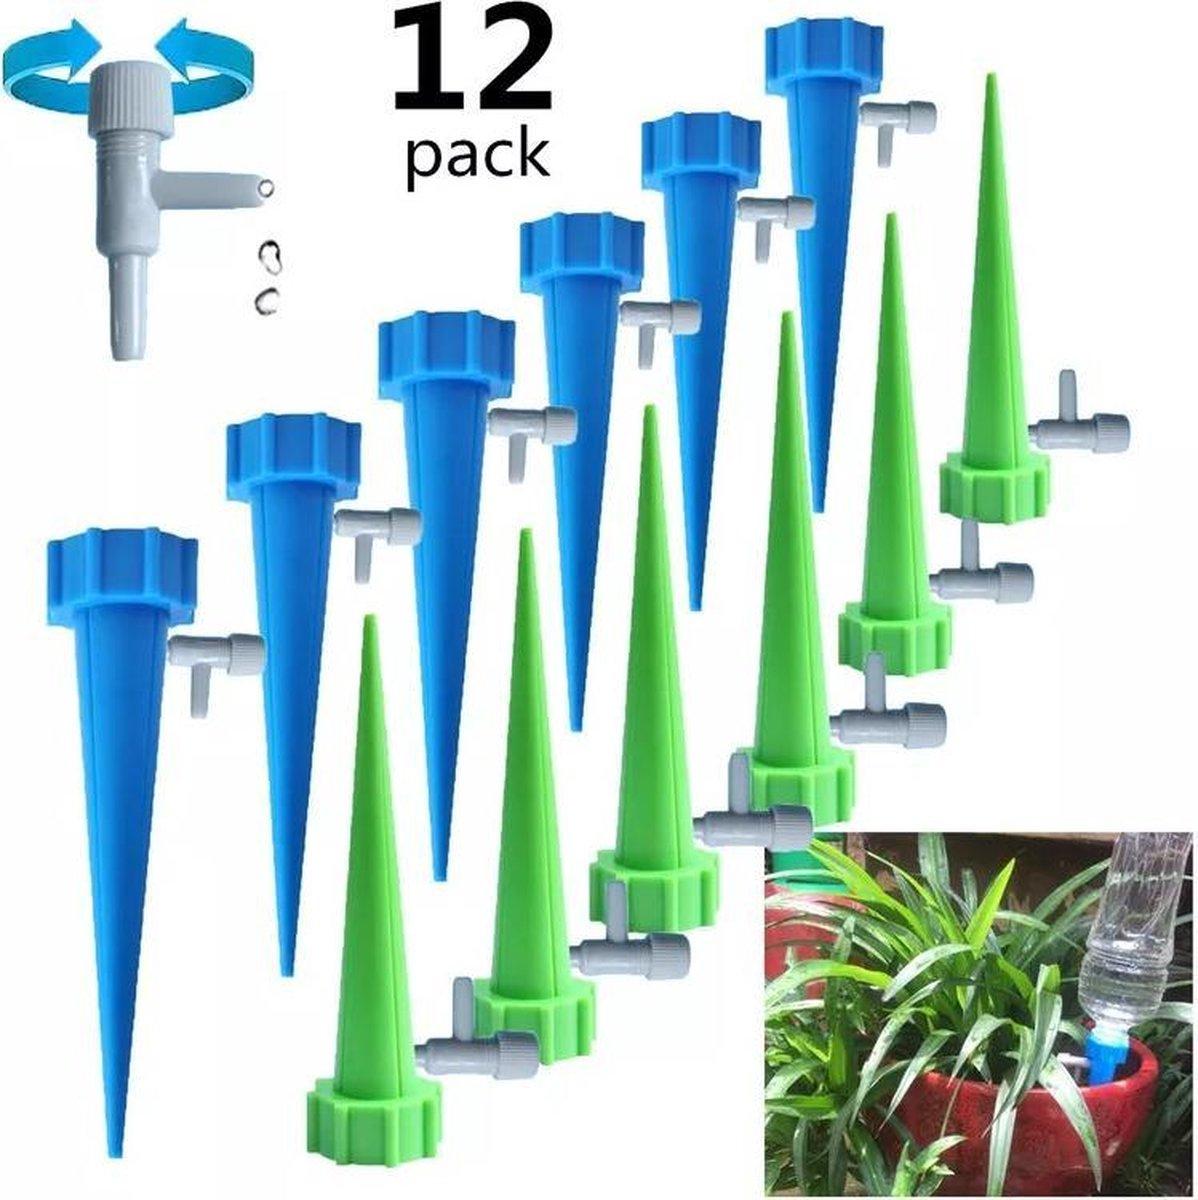 12 stuks plant bewateringssysteem | Waterdruppelaar | Druppelsysteem |Bewateringssysteem | Bewaterin